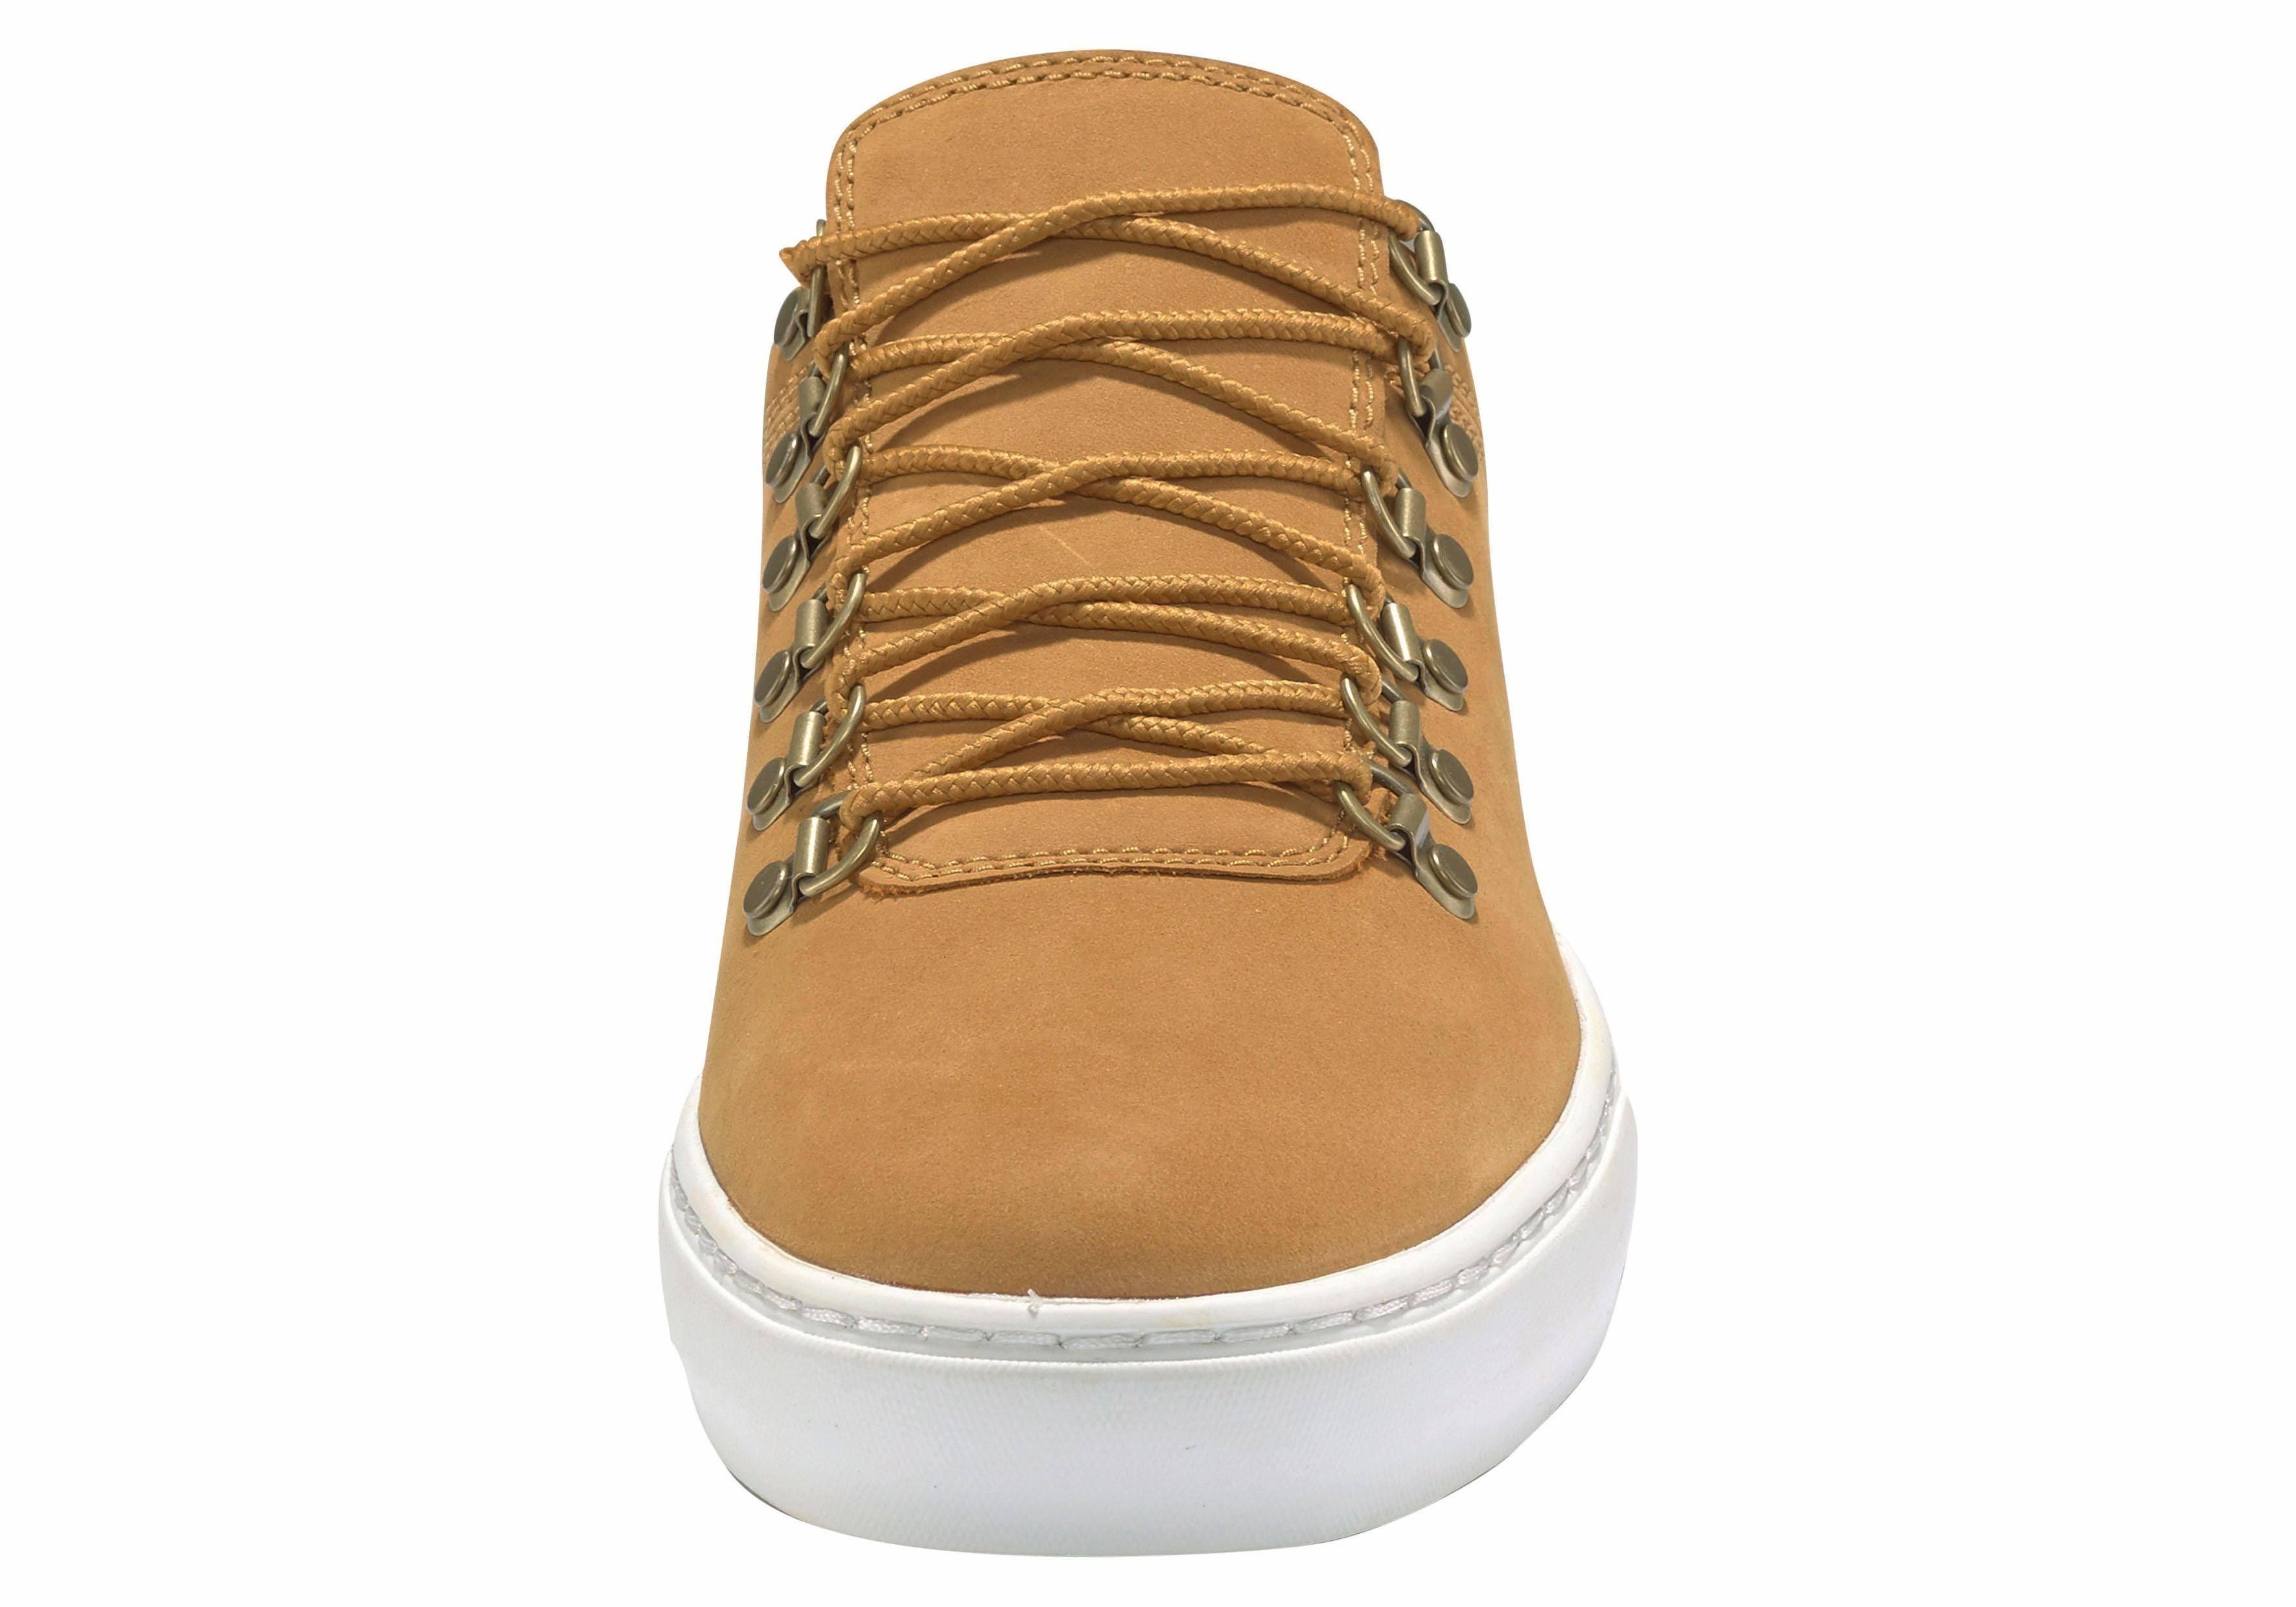 Größe Braun 2 Adv Ox Sneaker Alpine Gelb 40 Timberland 0 Cupsole OB7wxqP